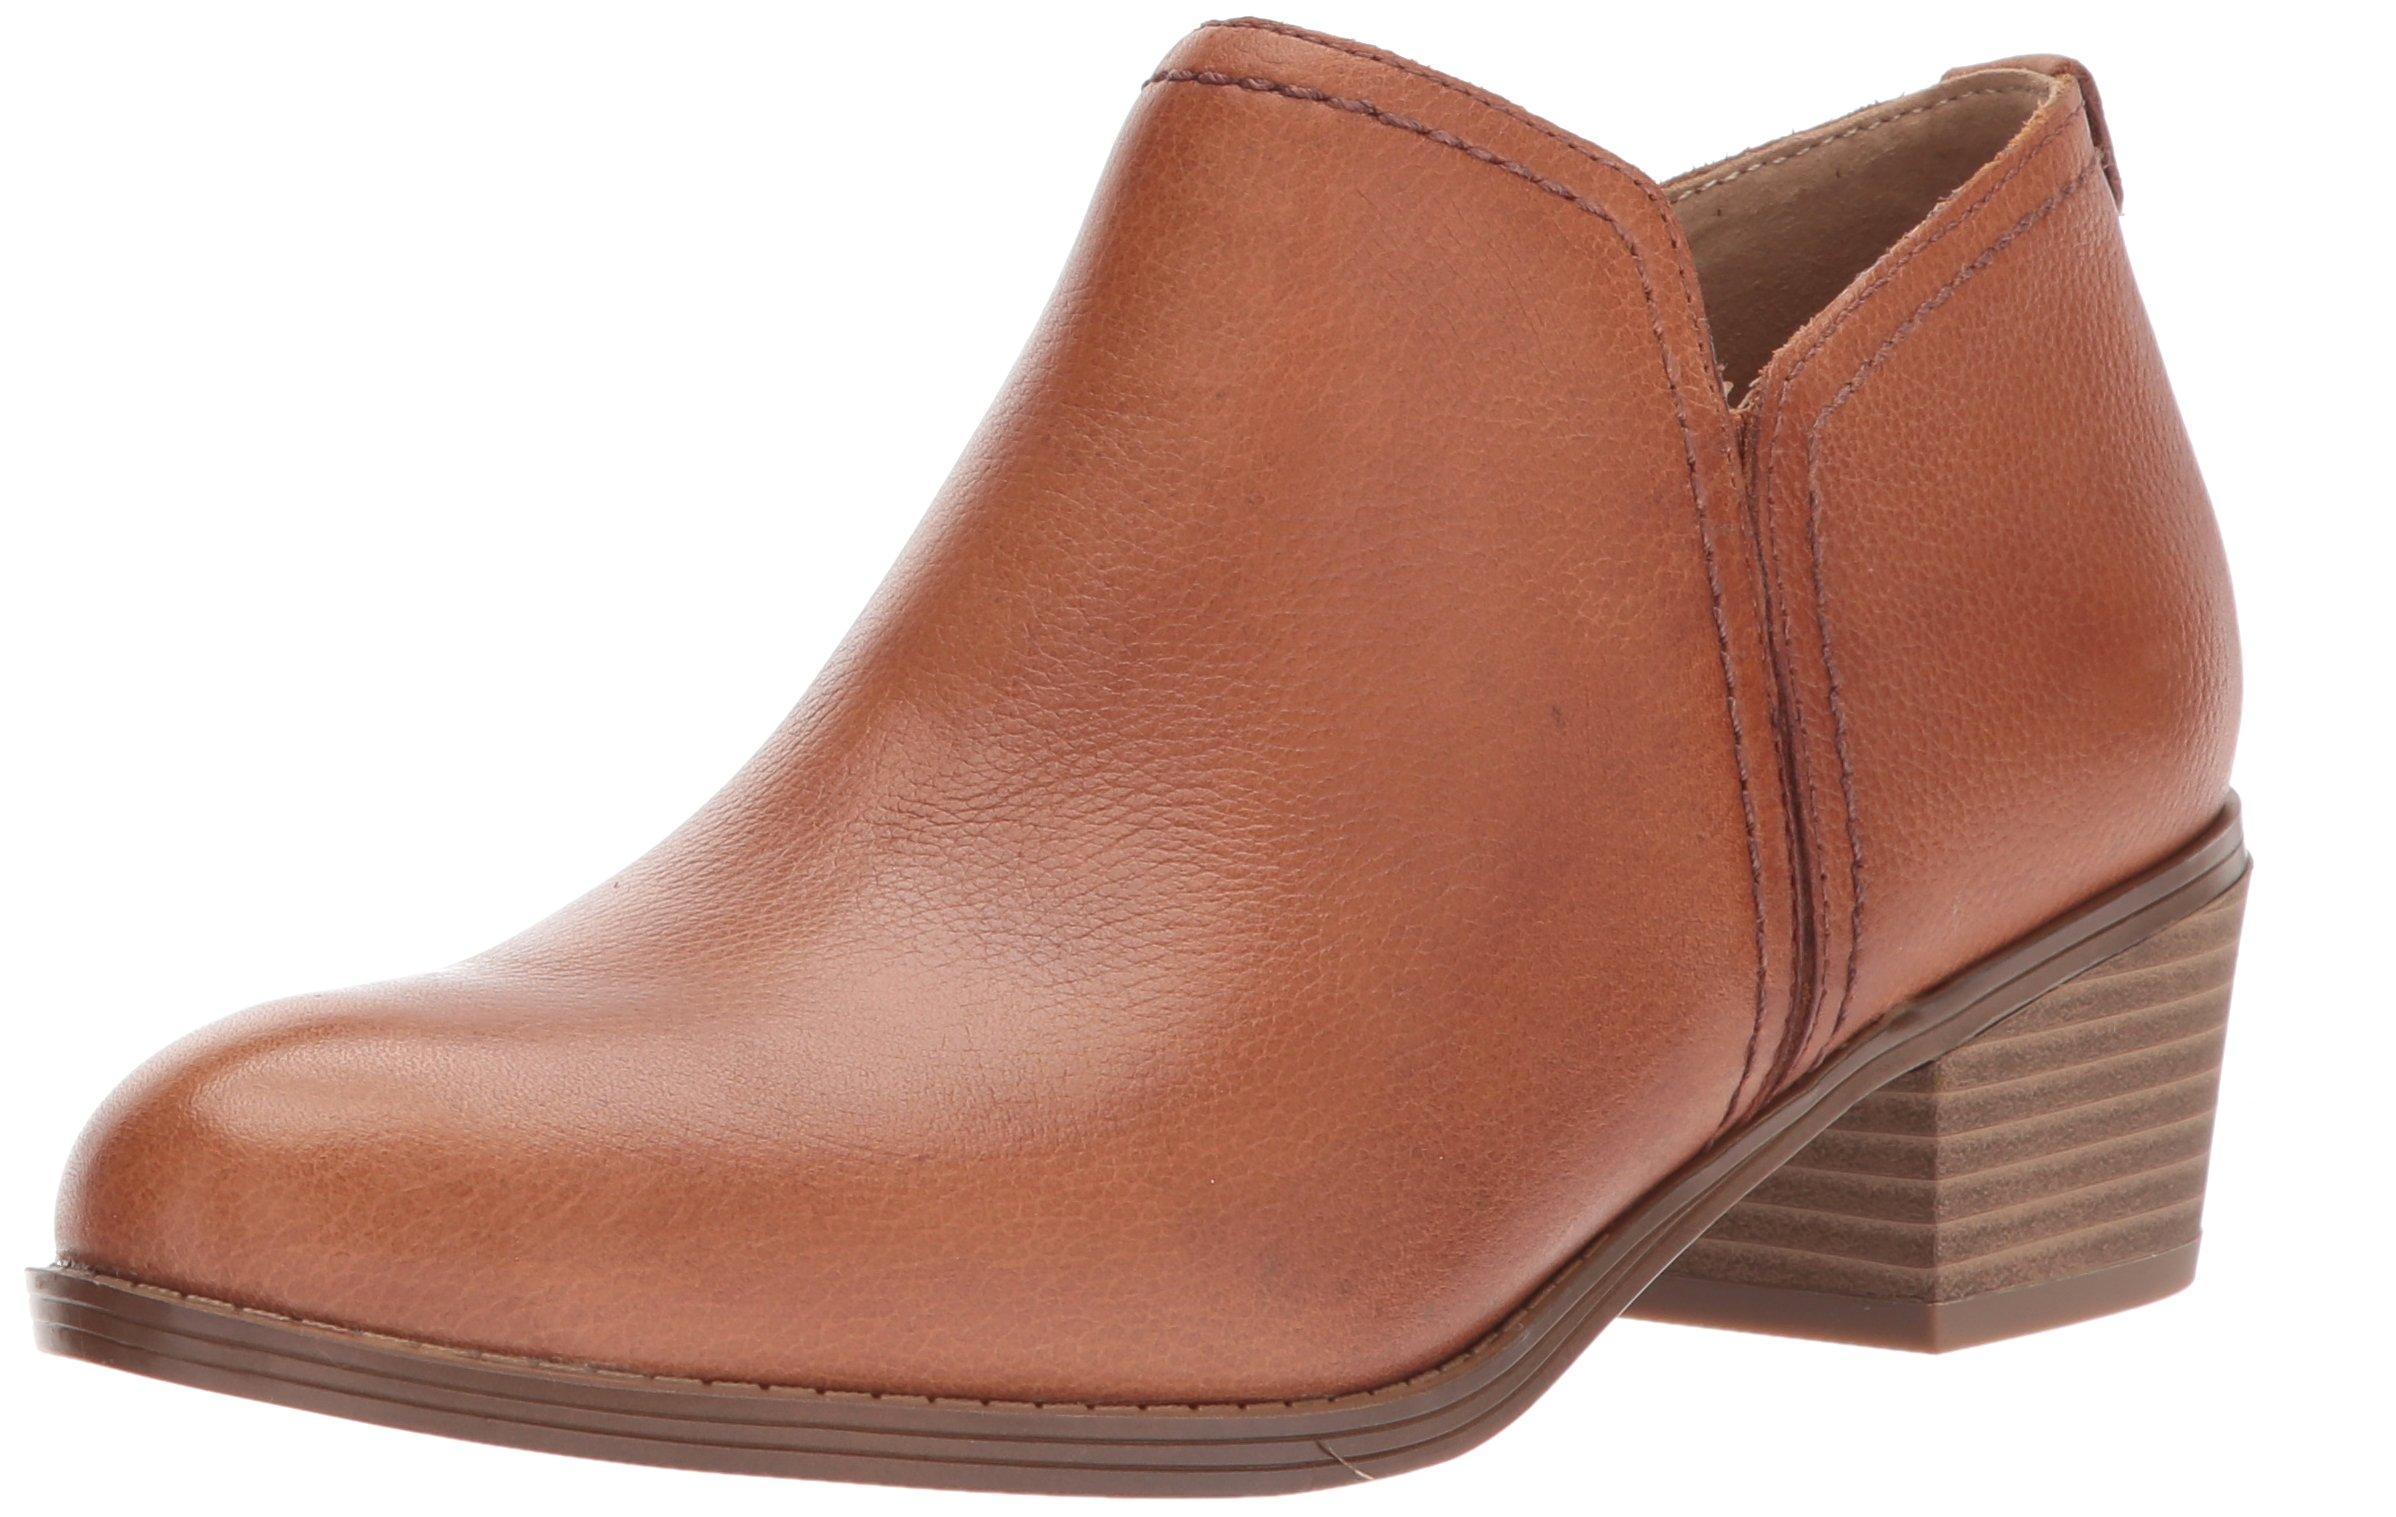 Naturalizer Women's Zarie Boot, Saddle, 7.5 M US